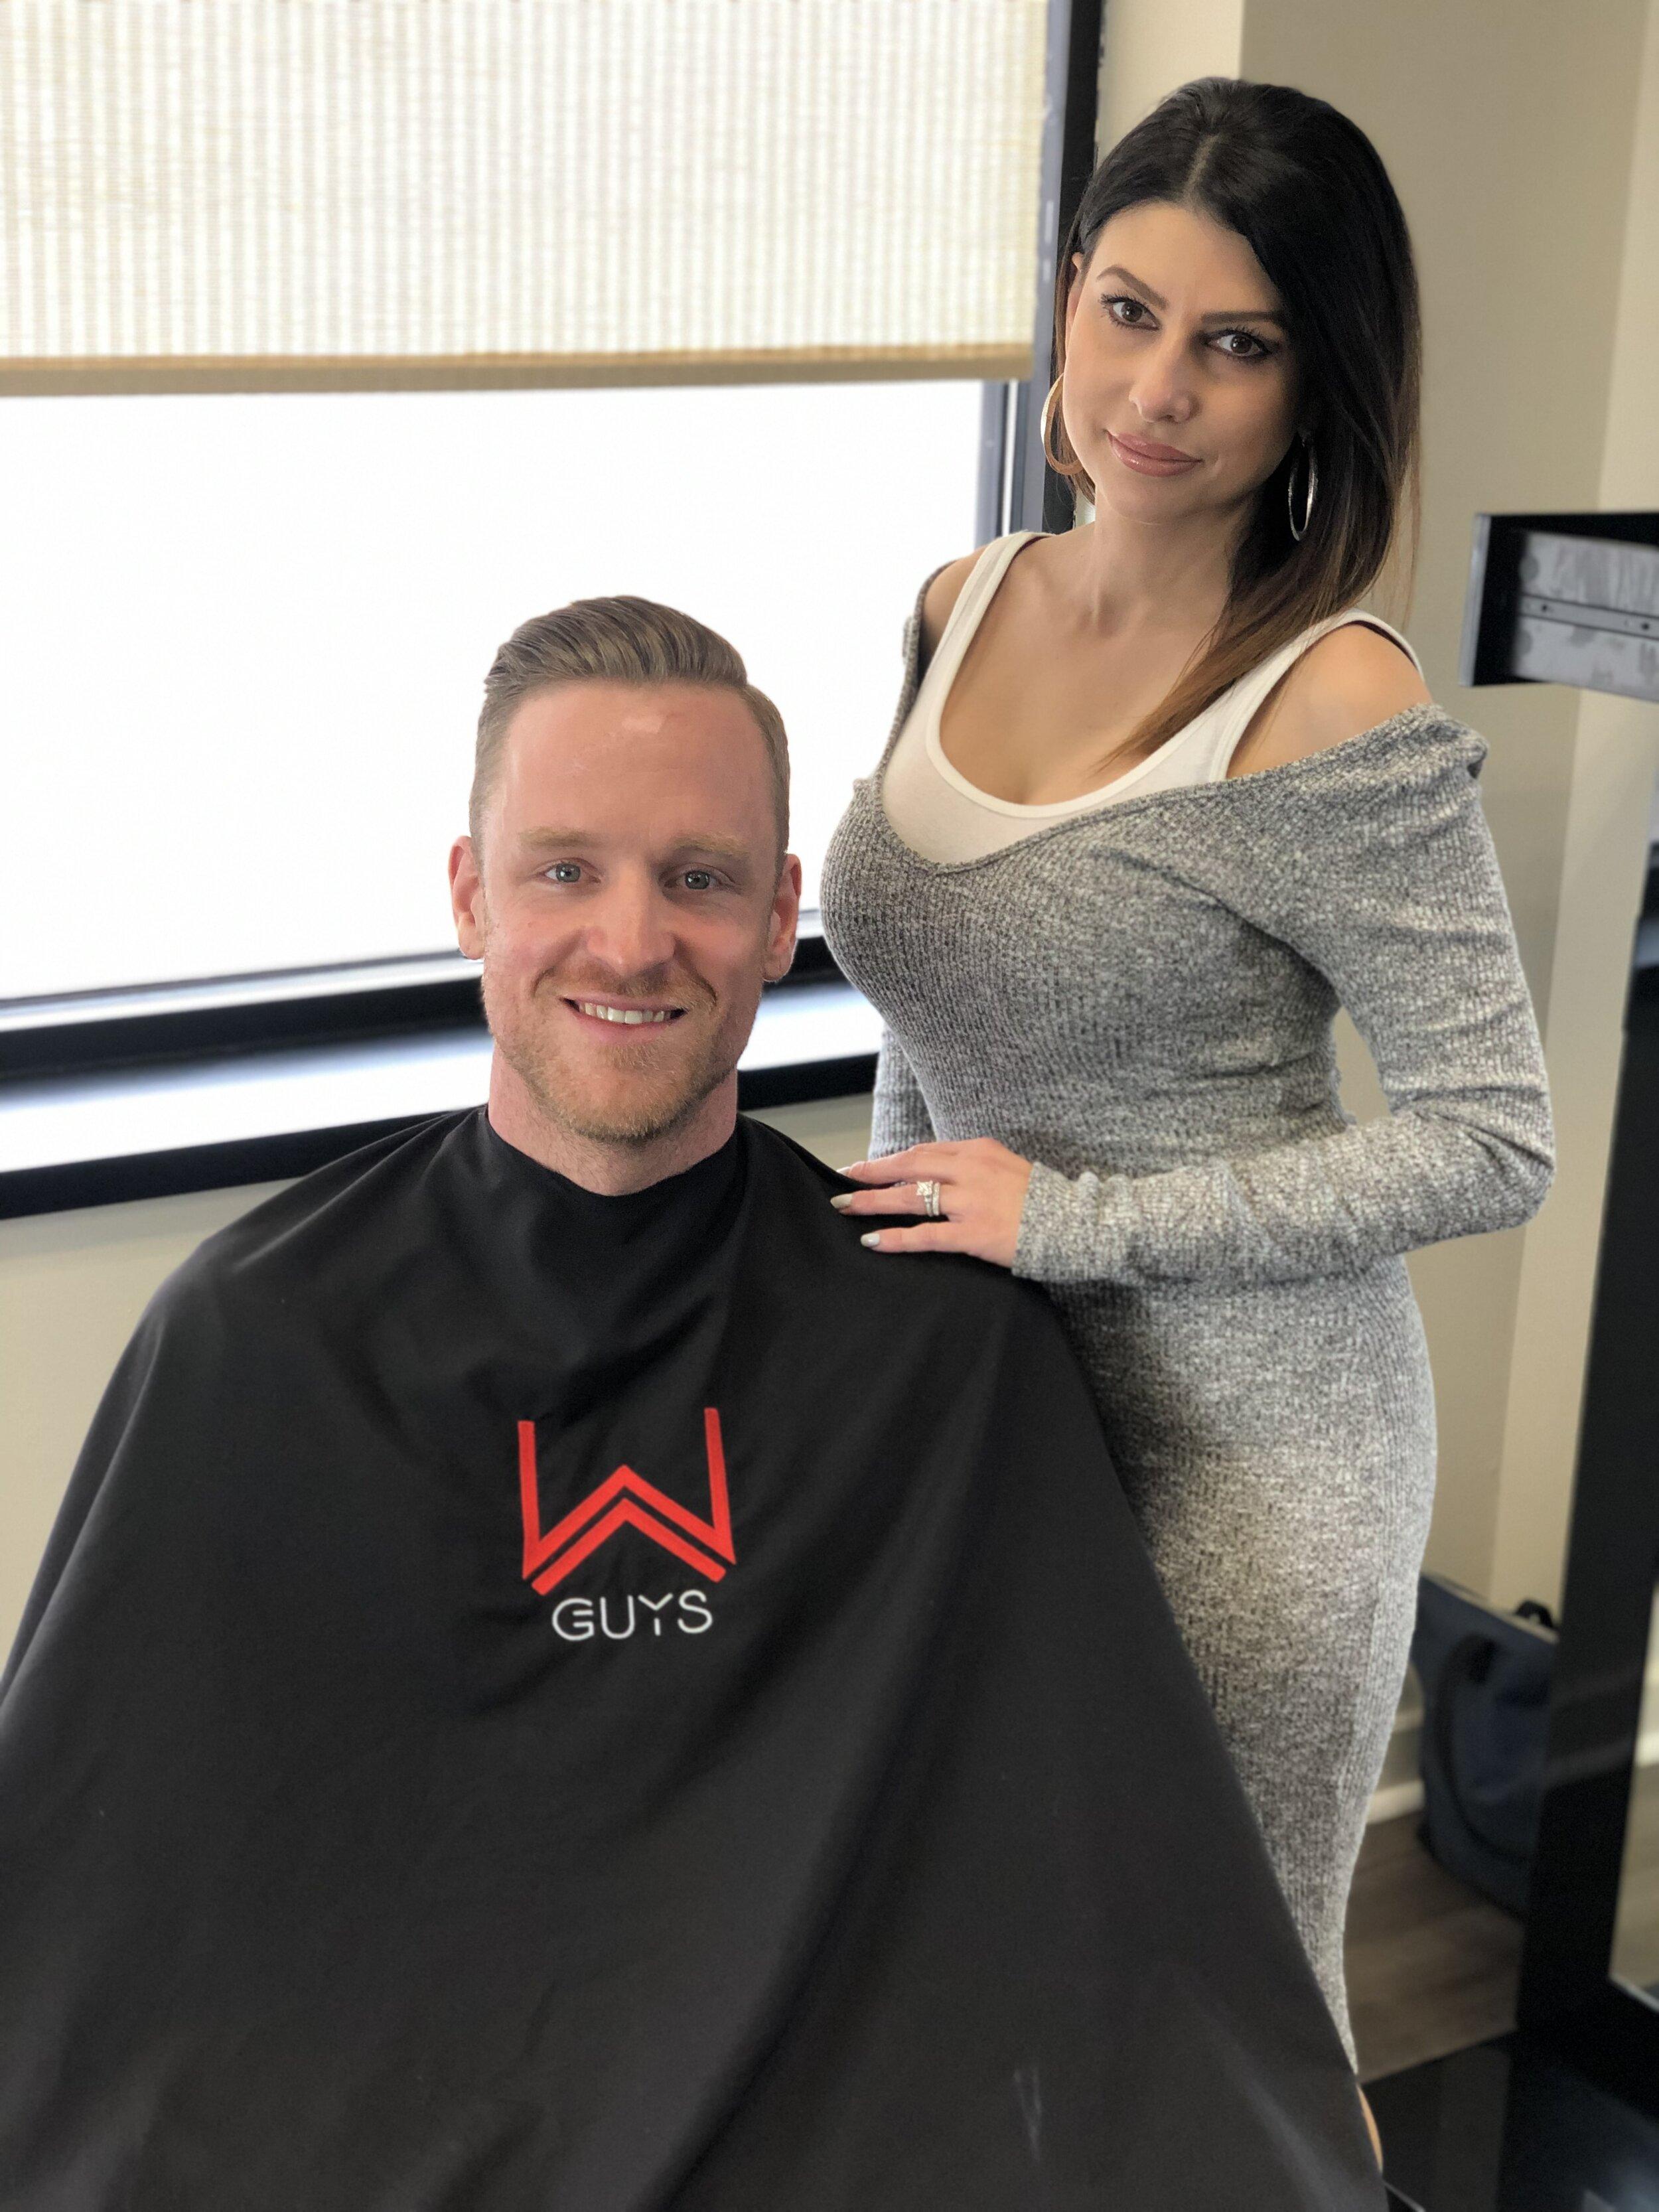 Men's Hair Salon, Barber Inspired, W Barber Spa & Salon. Modern Mens Salon - Barbershop Grooming